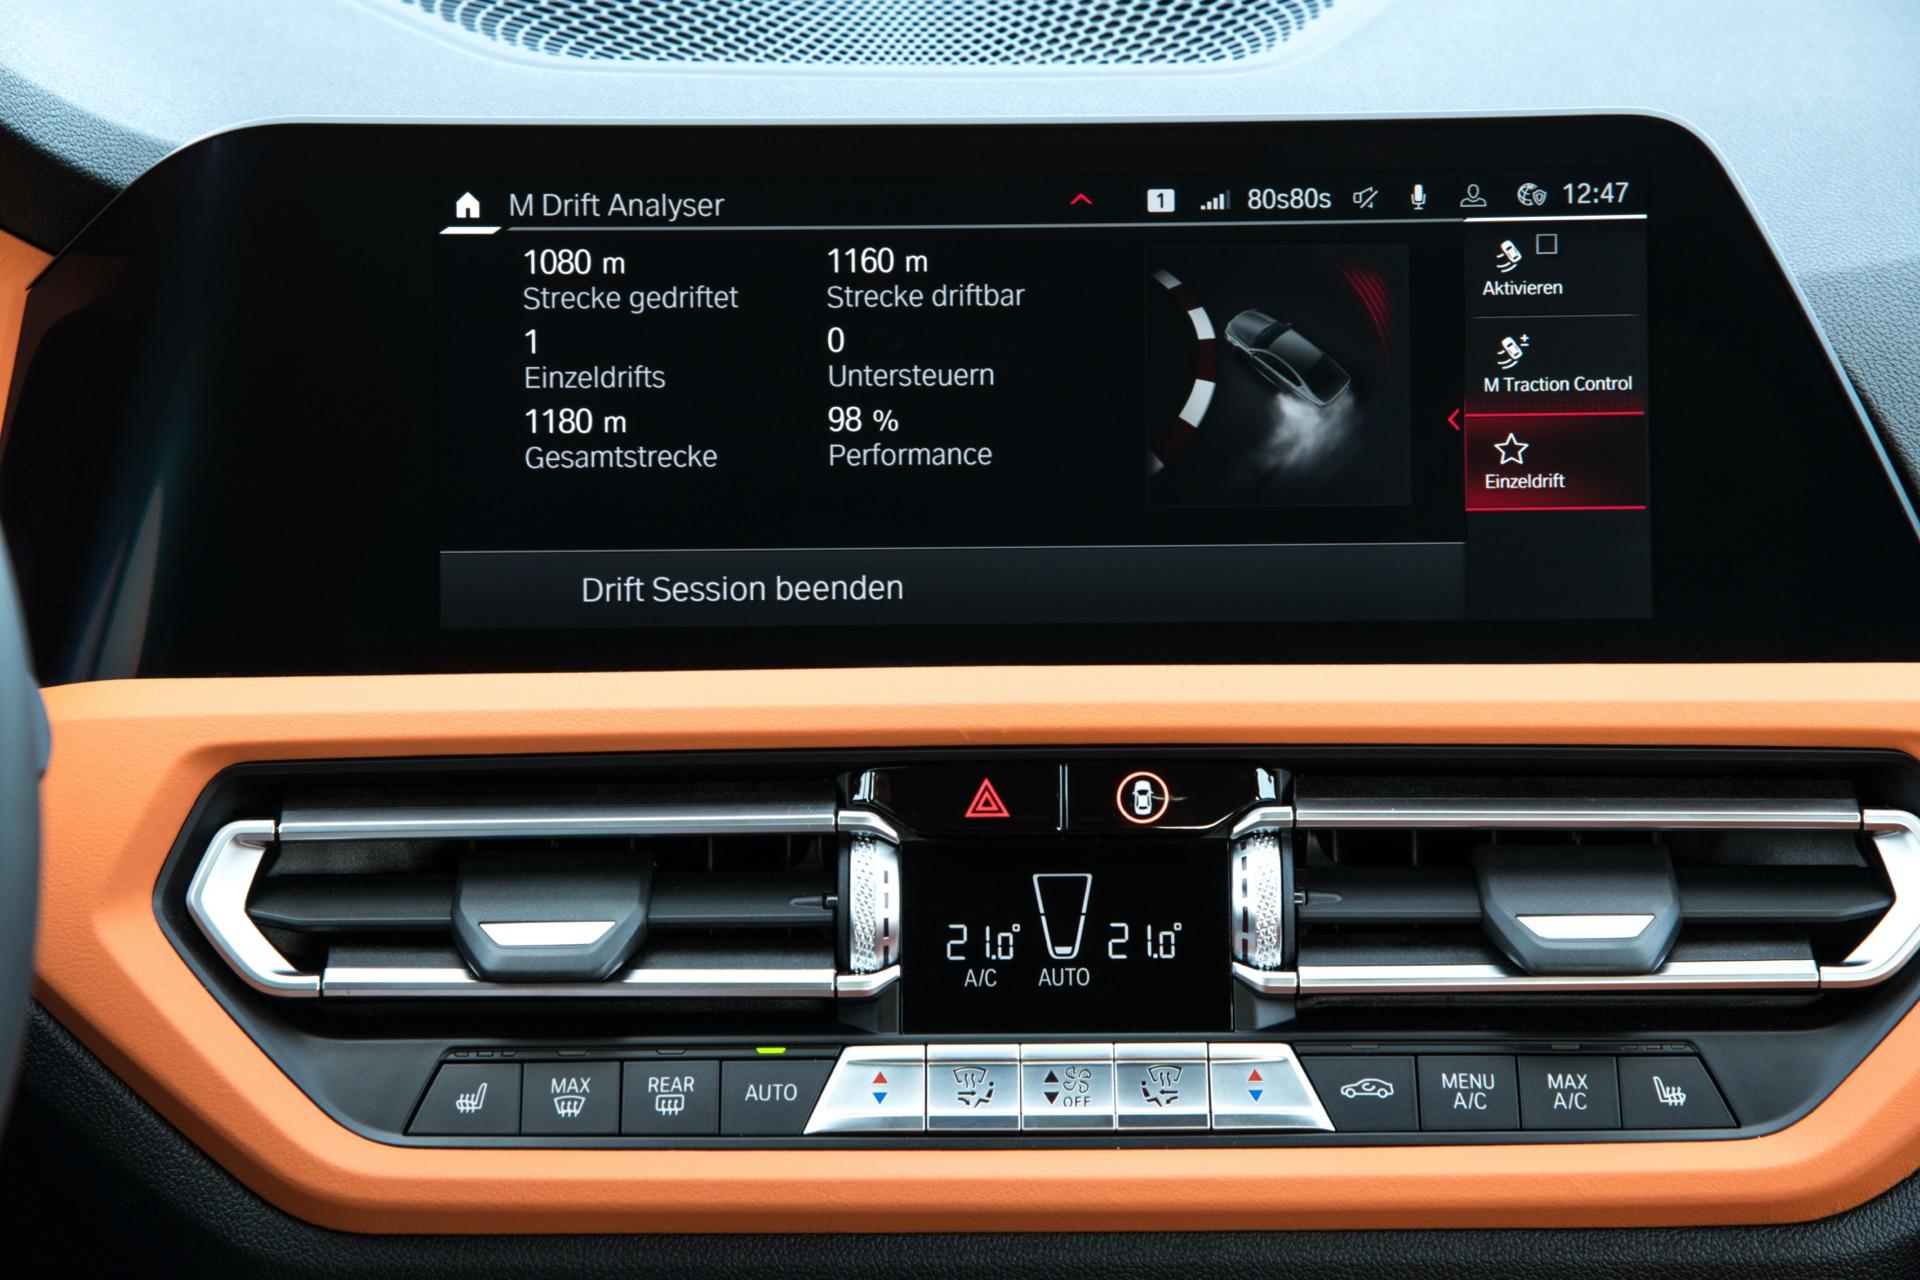 2022 BMW M3 infotainment